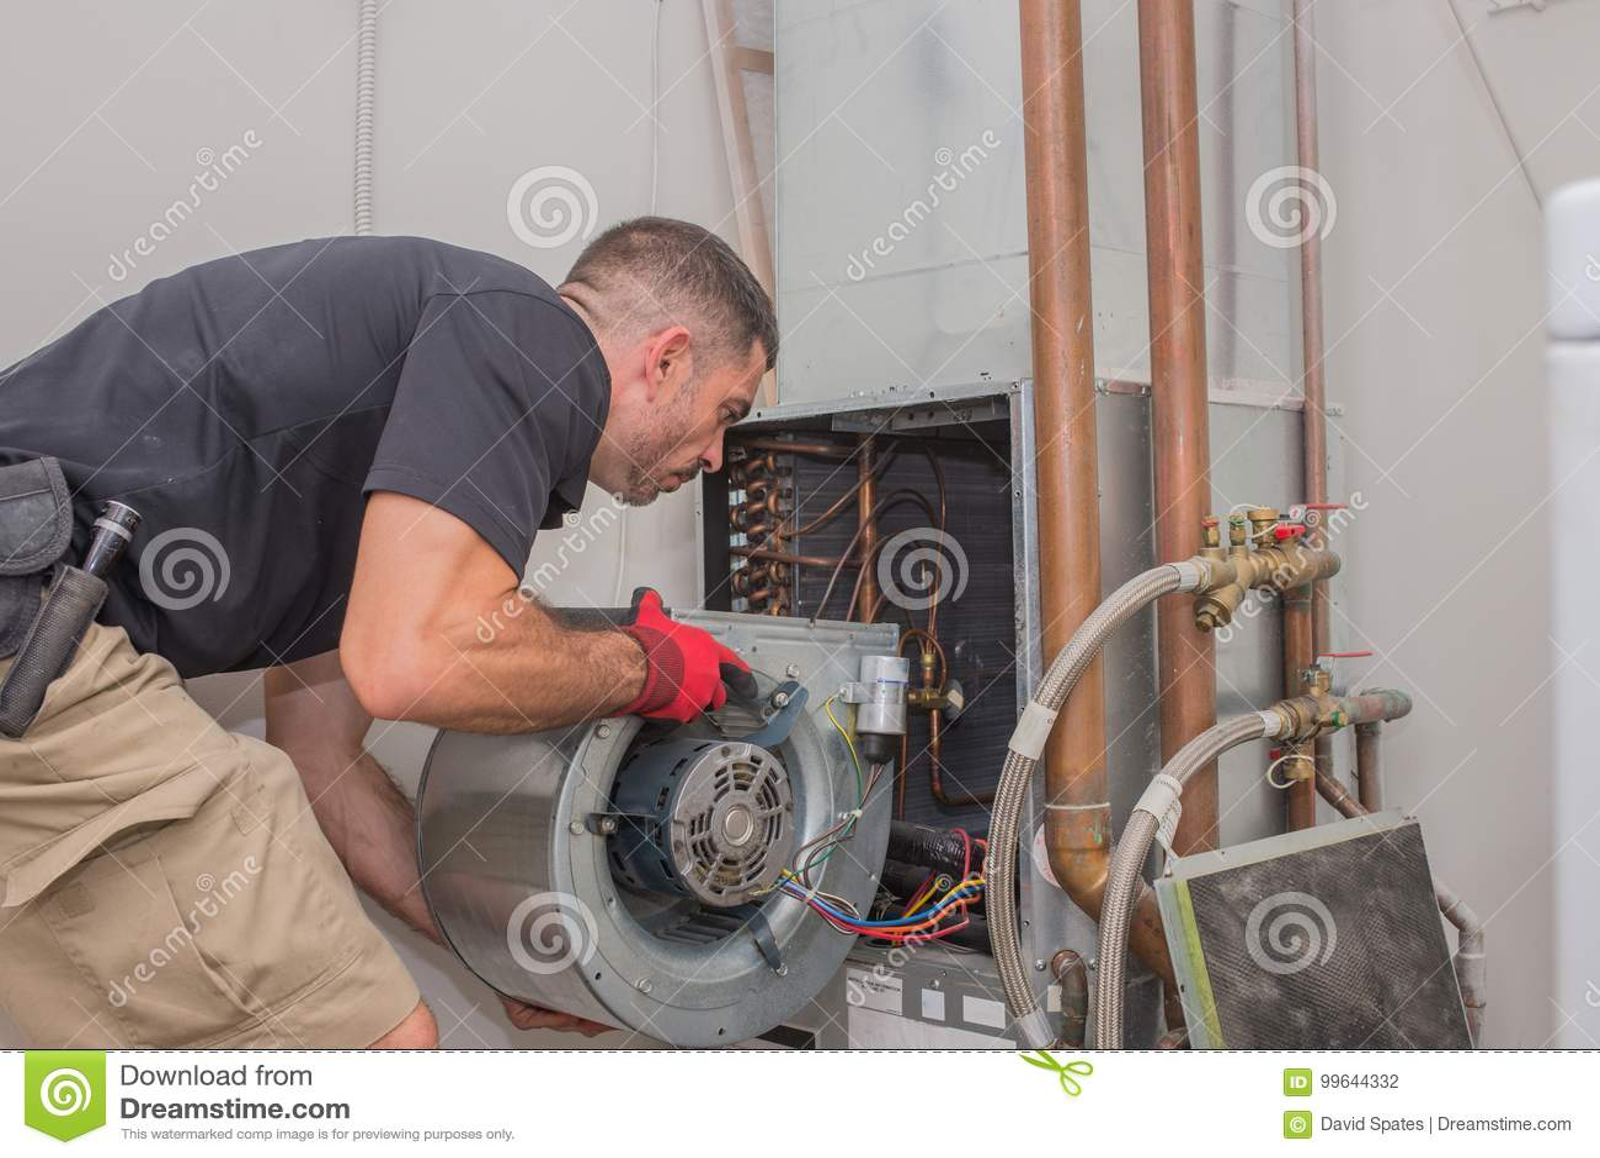 Hvac technician with Motor